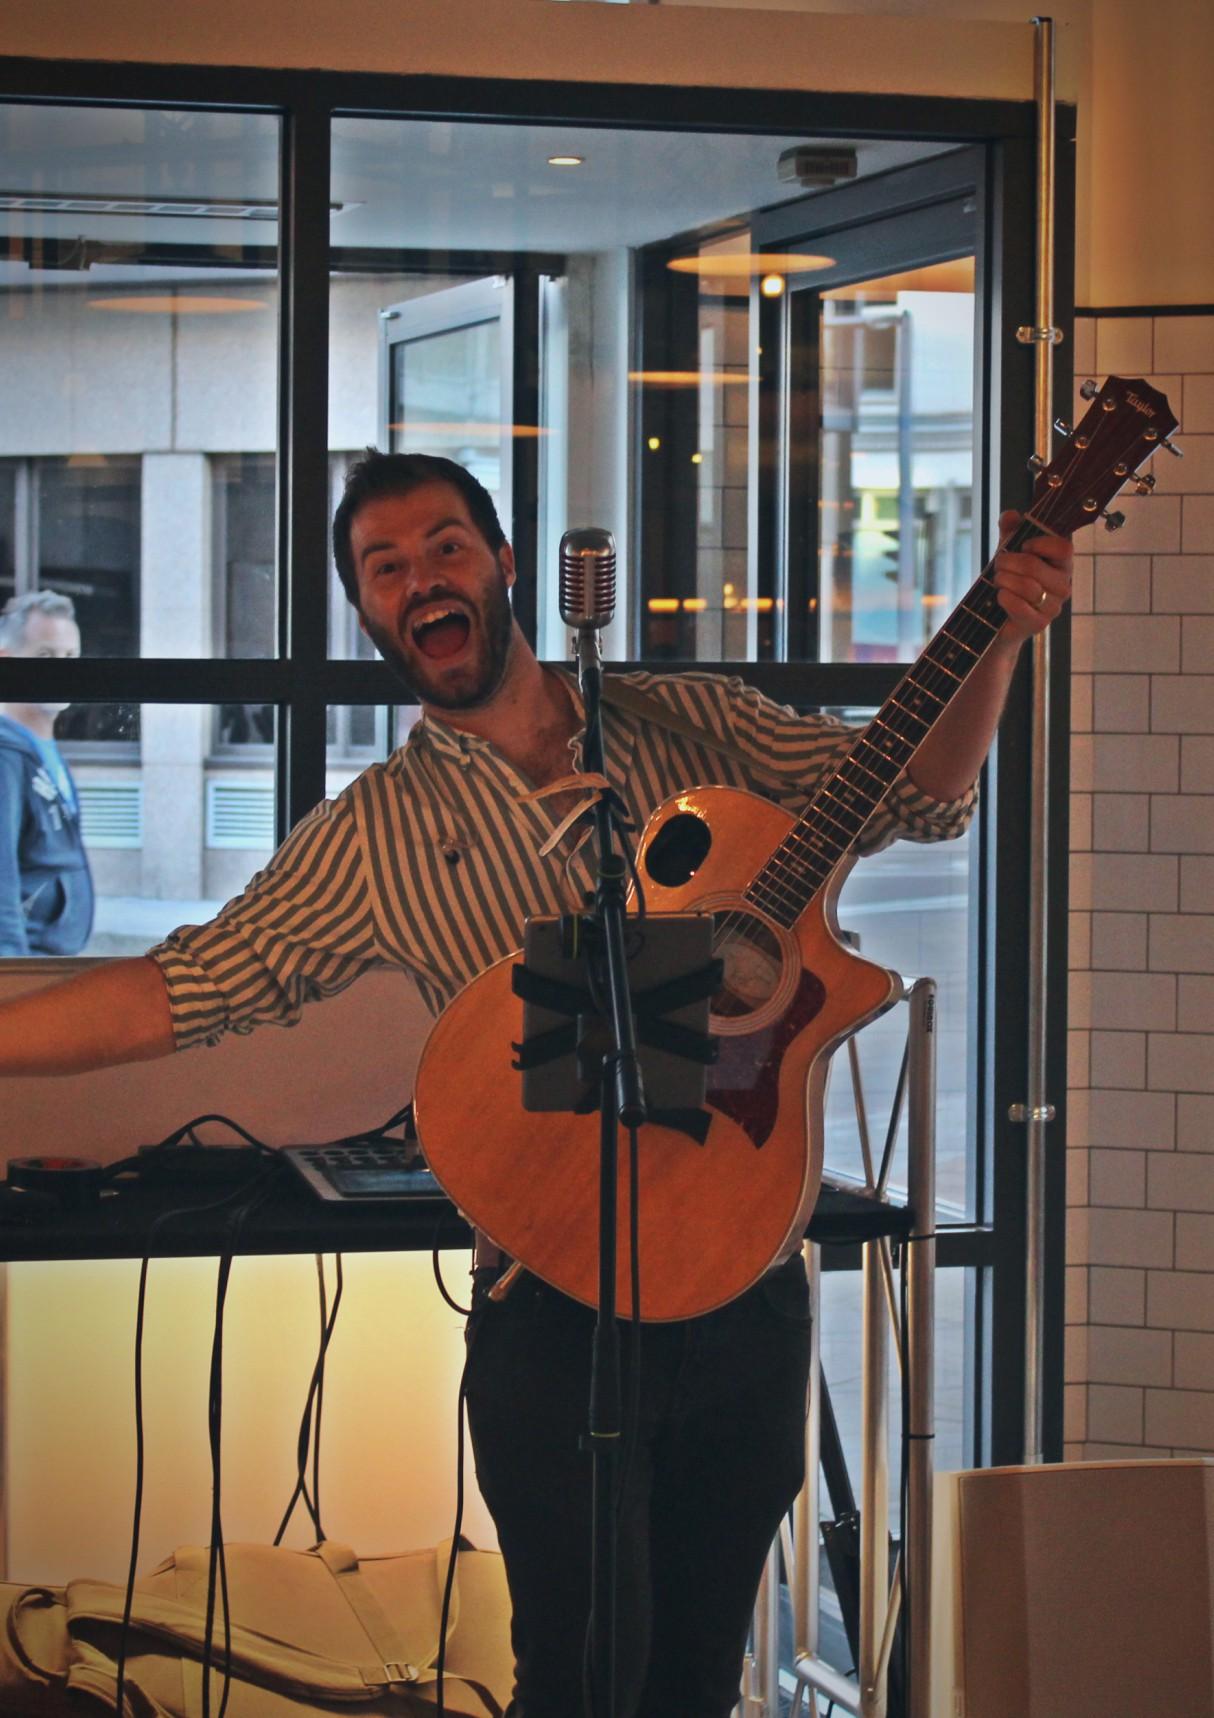 gourmet-bar-kitchen-review-novotel-london-bridge-music